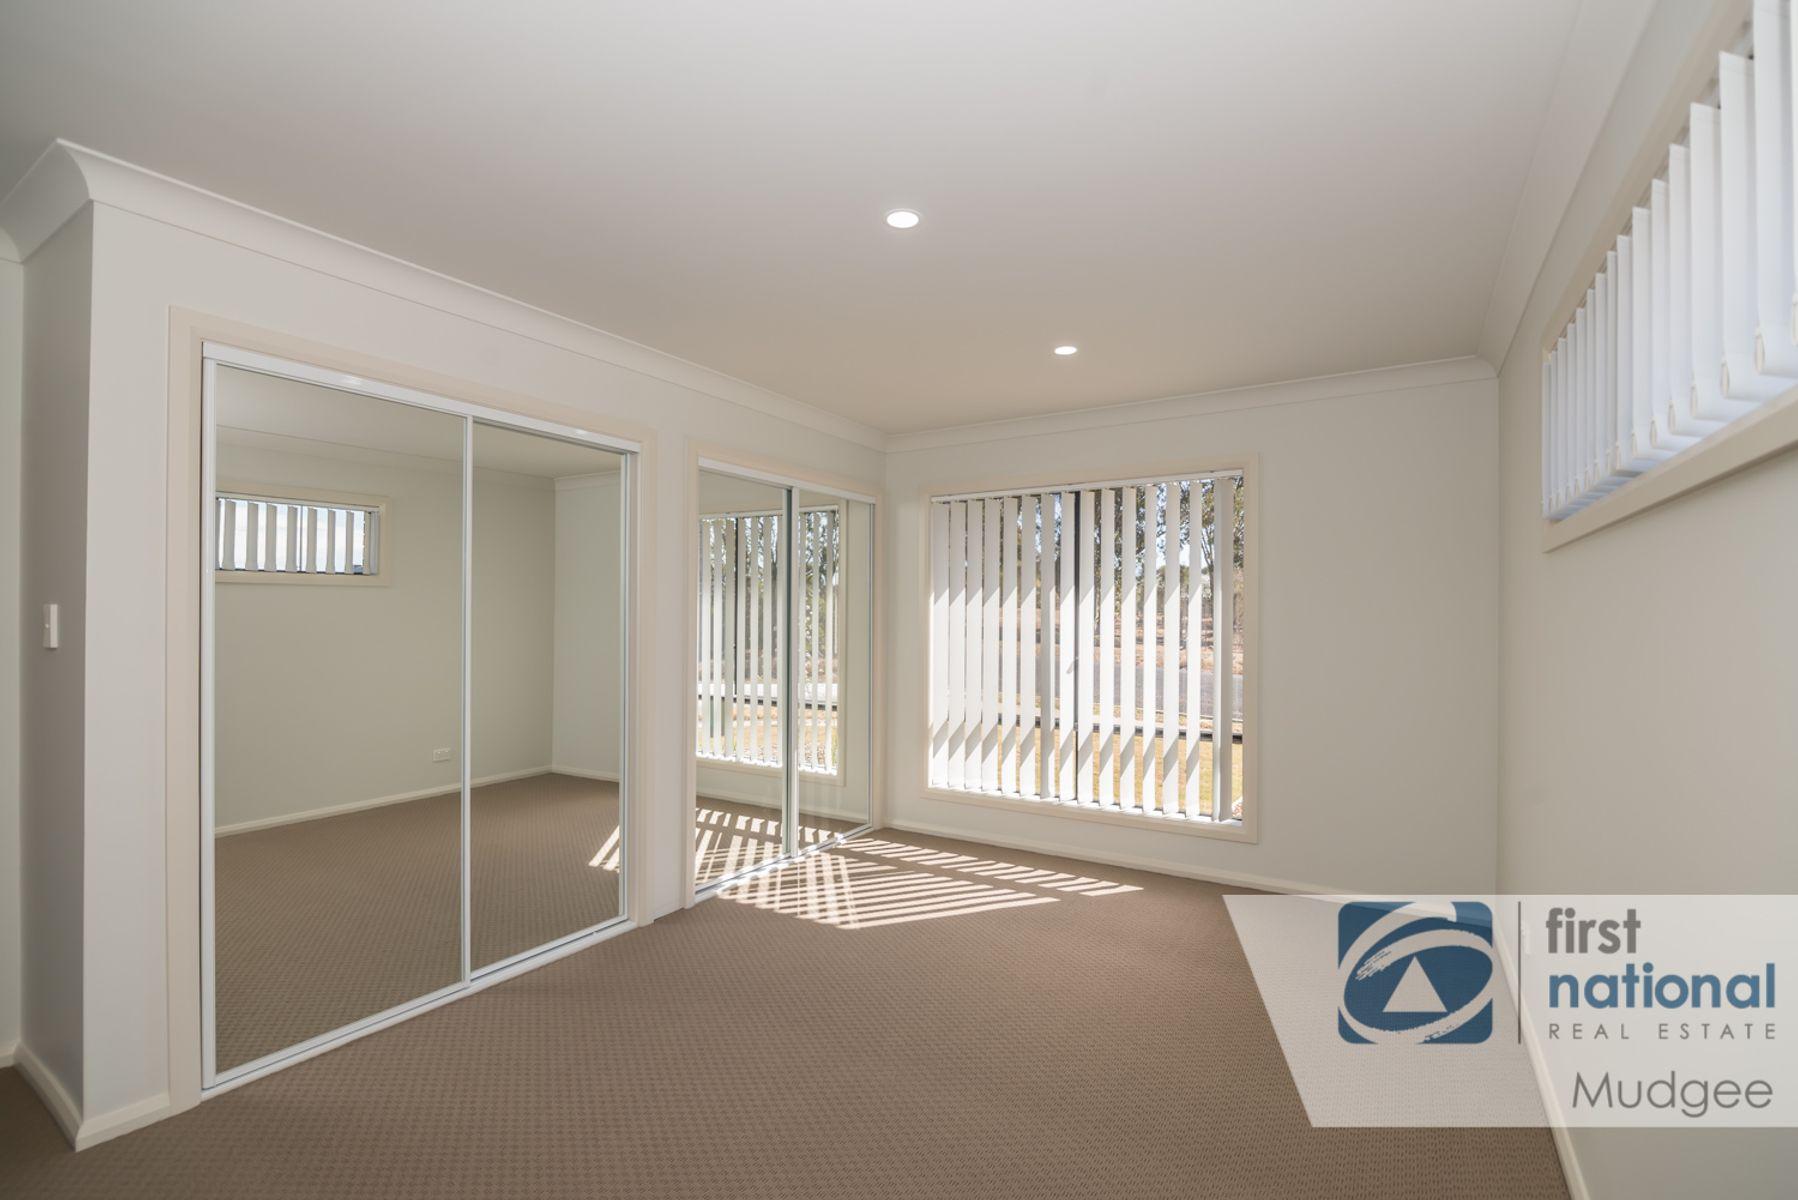 69 Fairydale Lane, Mudgee, NSW 2850